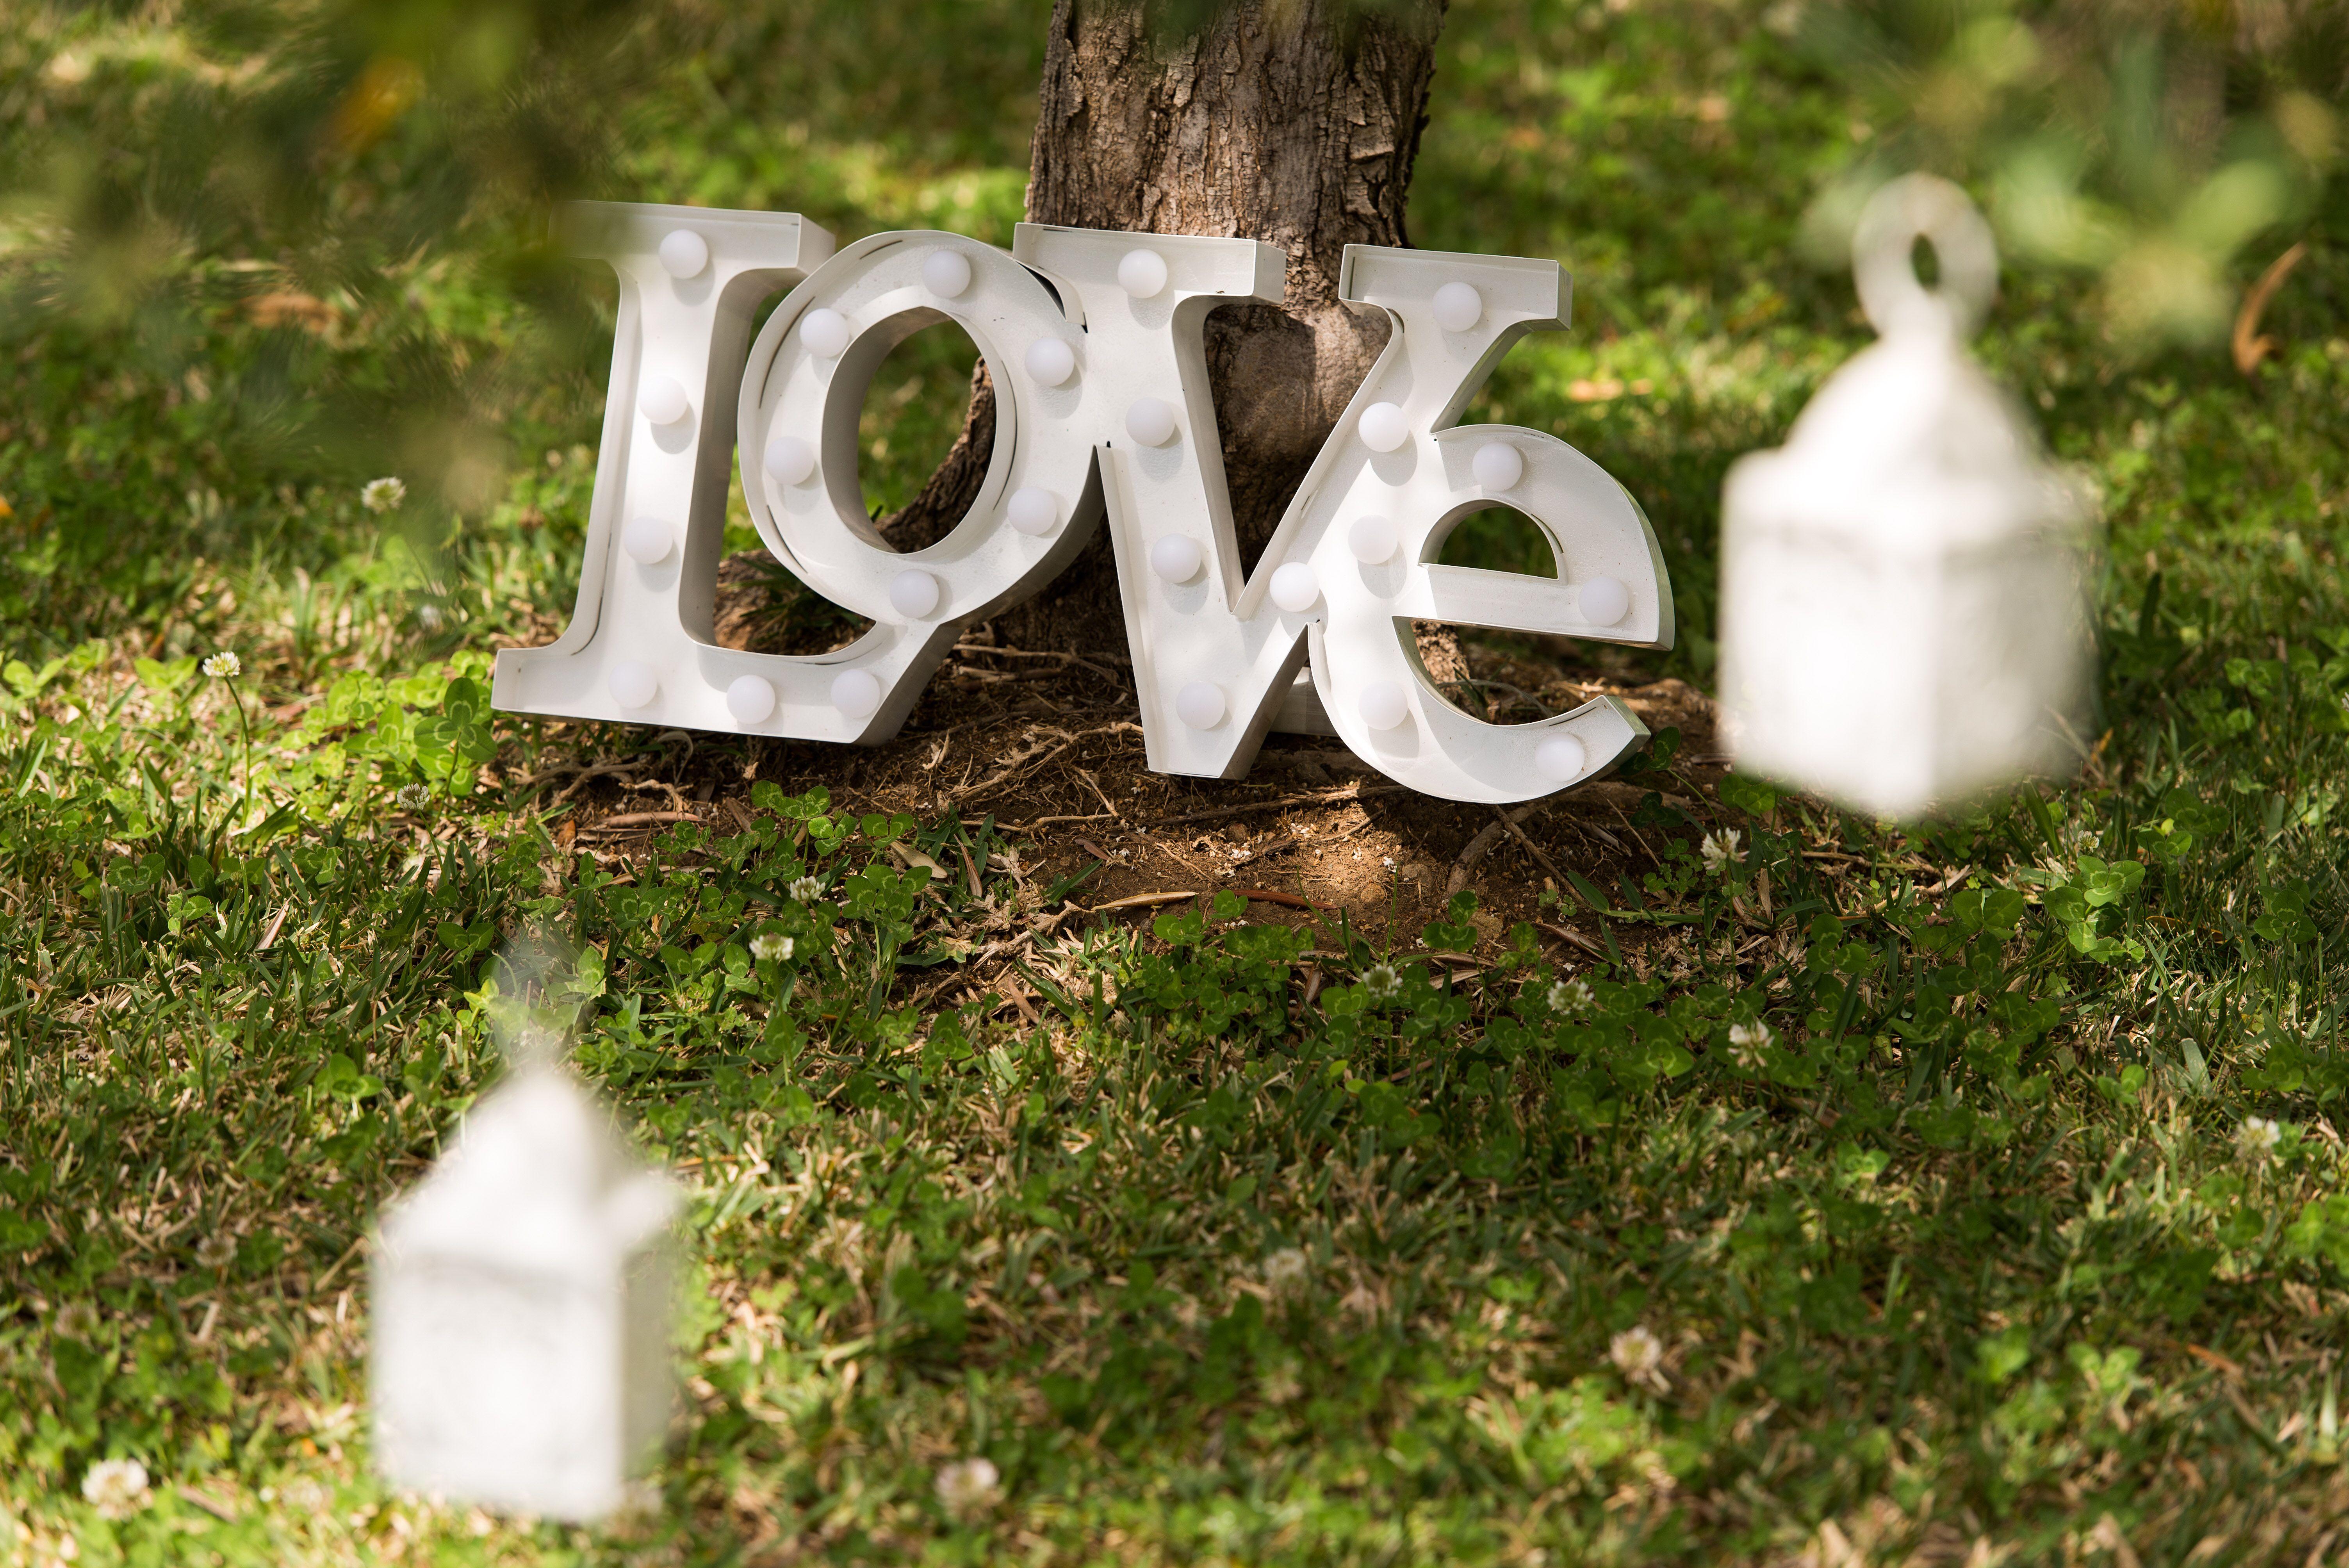 Illuminated words and lanterns make perfect wedding decor